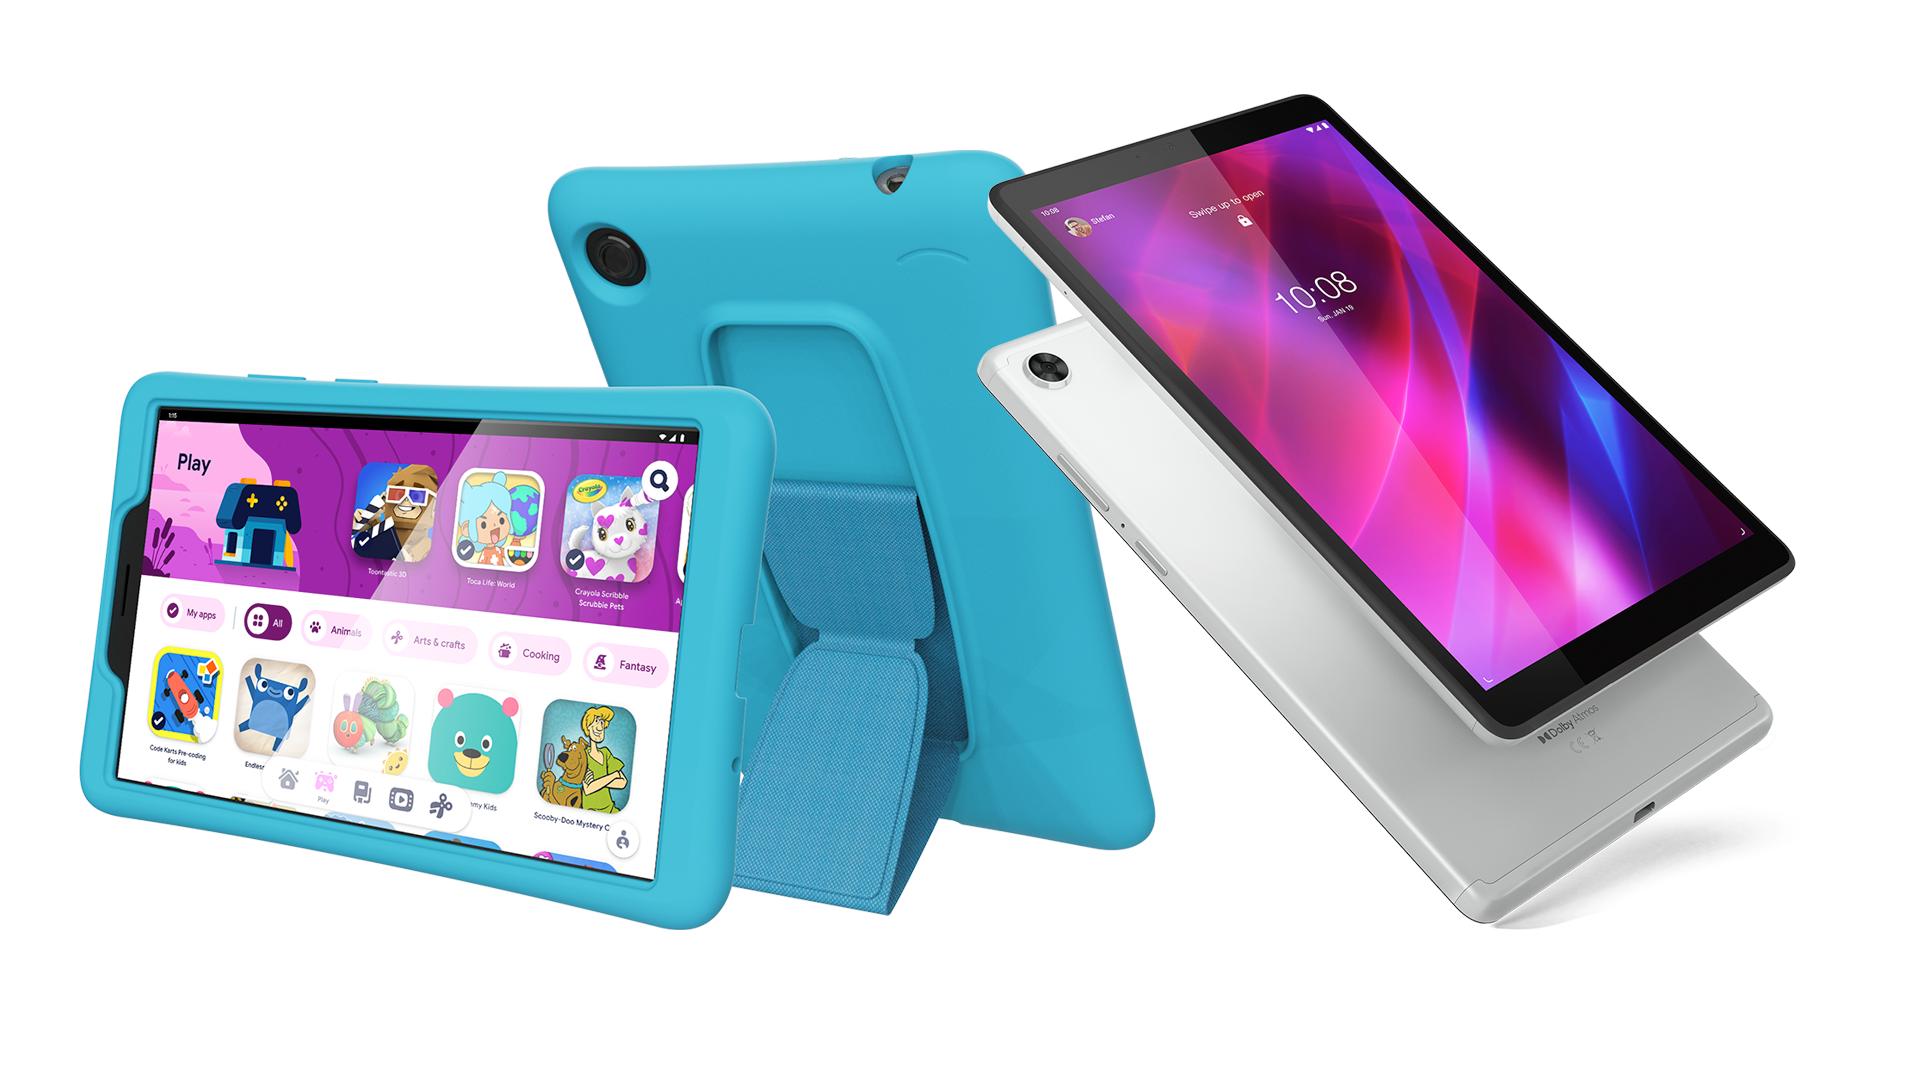 The Lenovo Yoga Tab M7 and M8 (Gen 3)